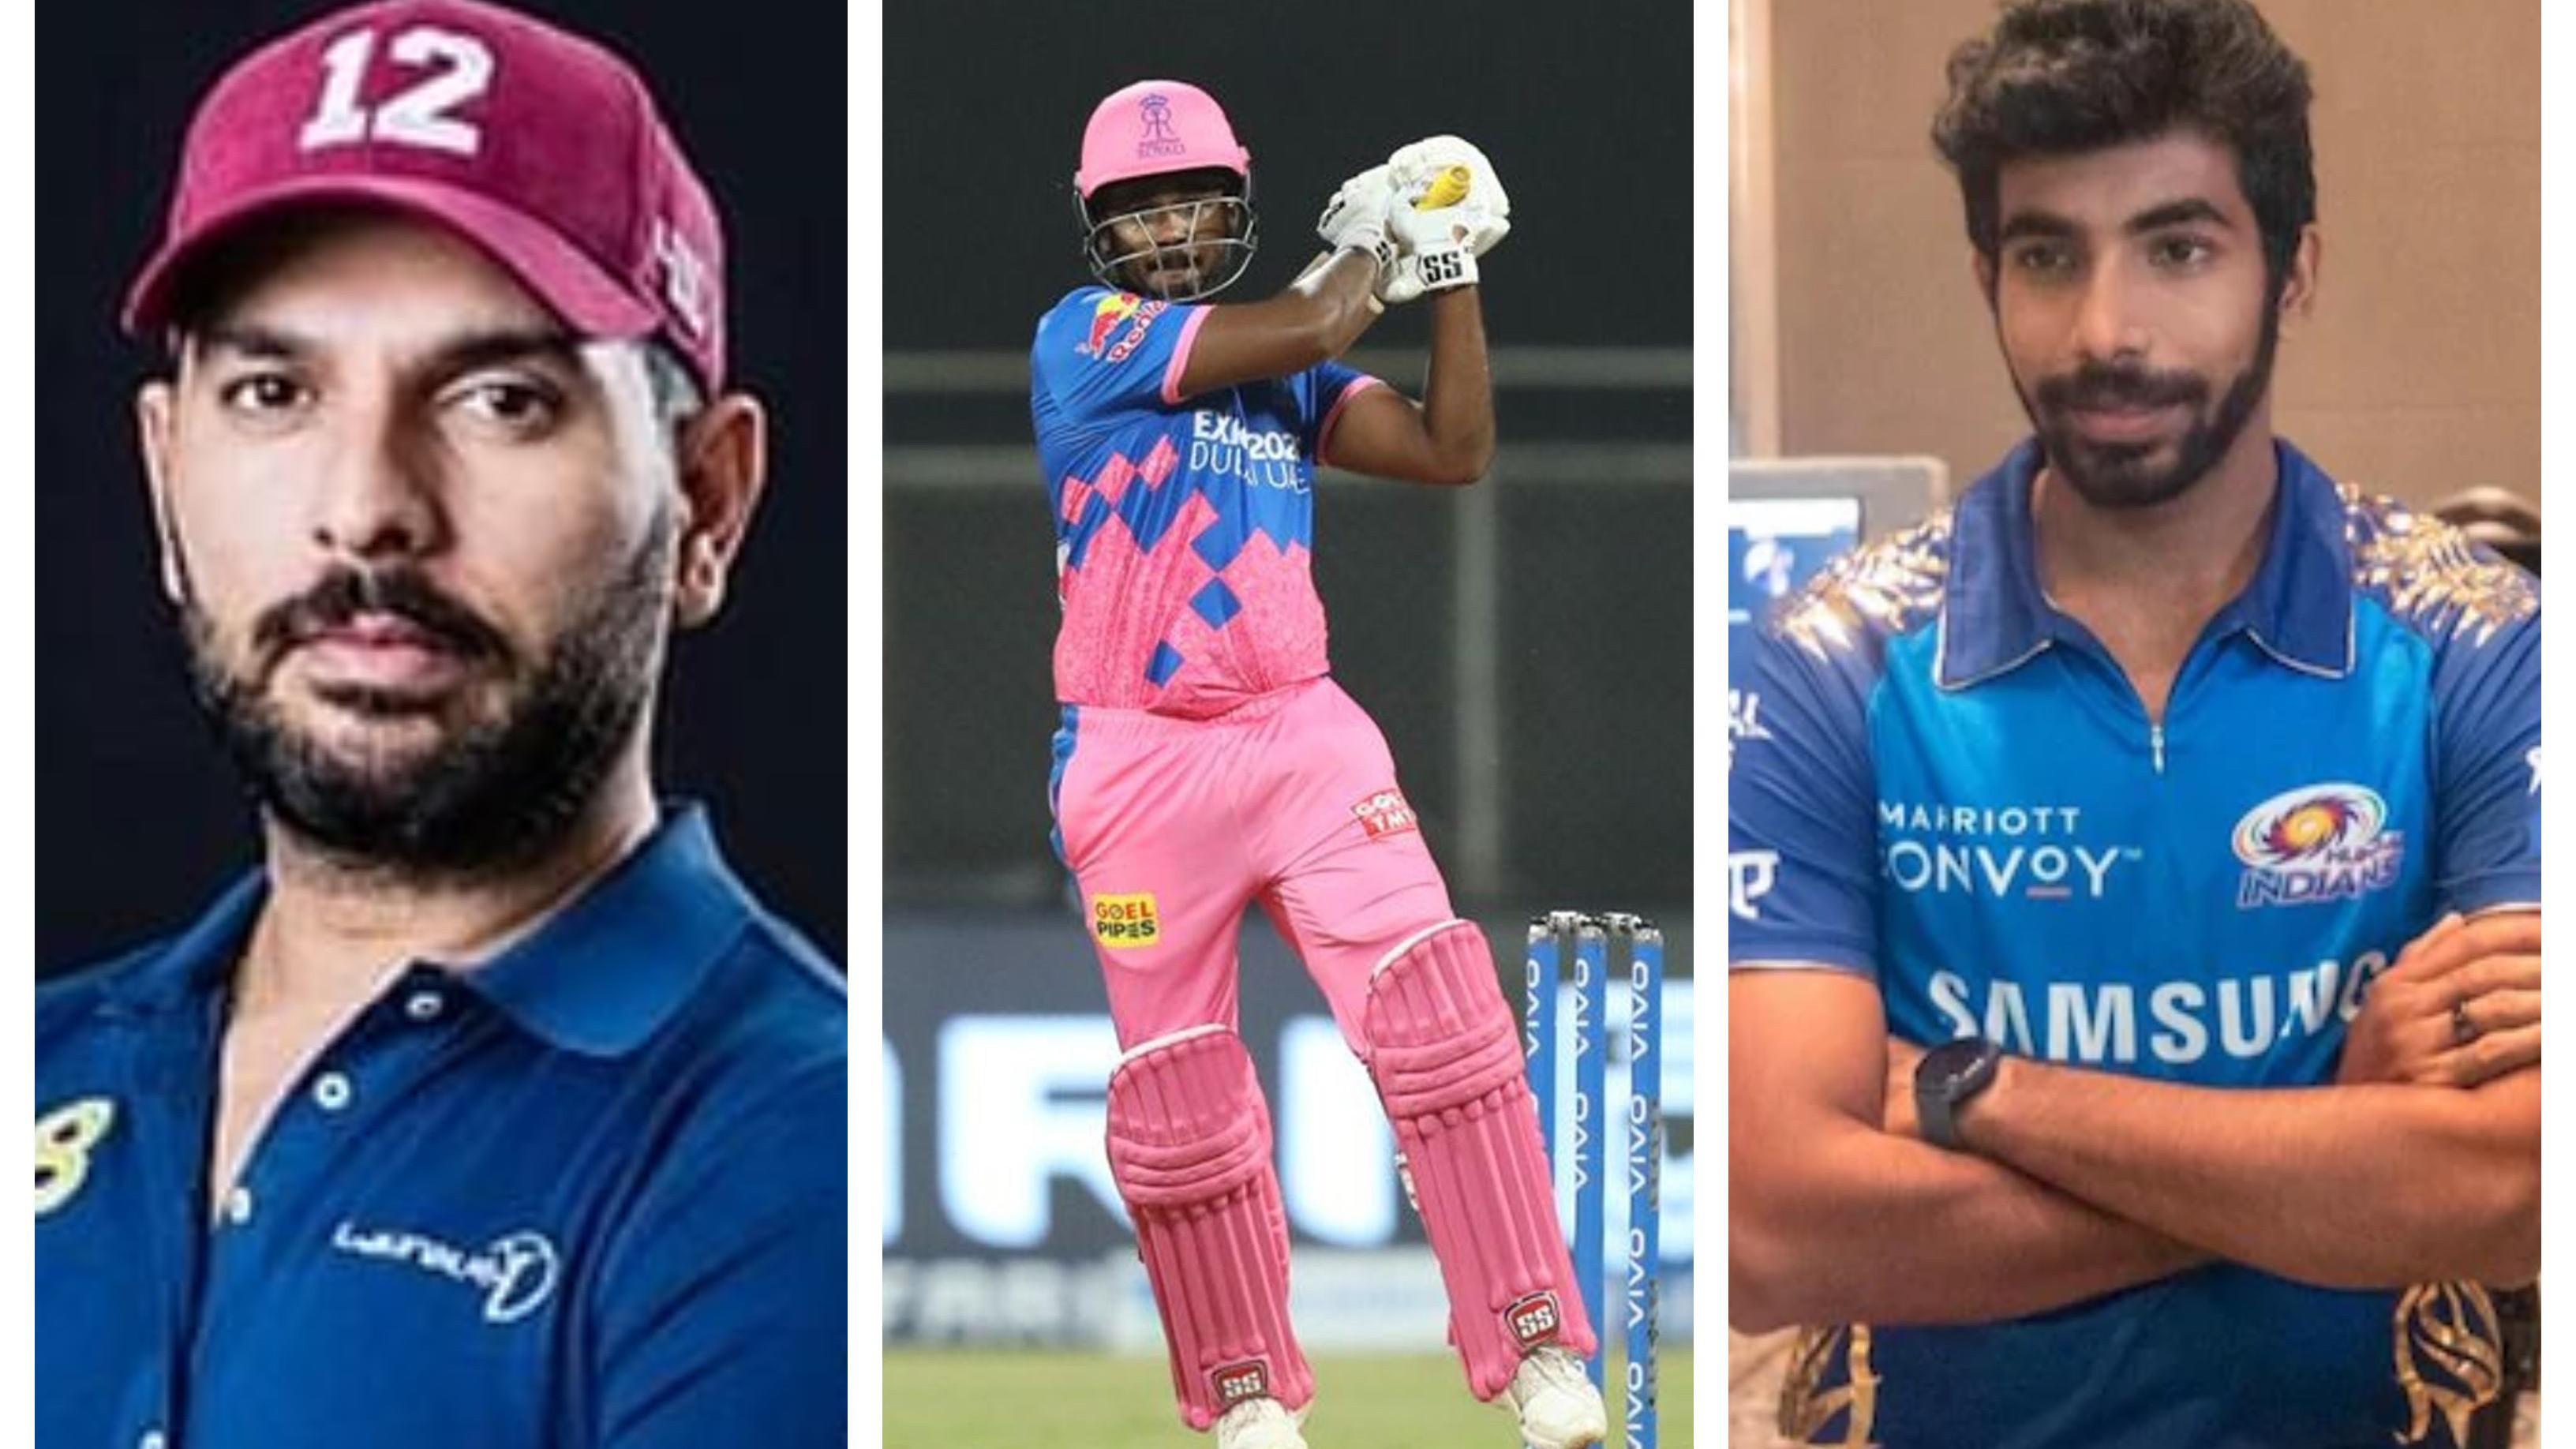 IPL 2021: Cricket fraternity applauds valiant Sanju Samson ton as PBKS win a thriller